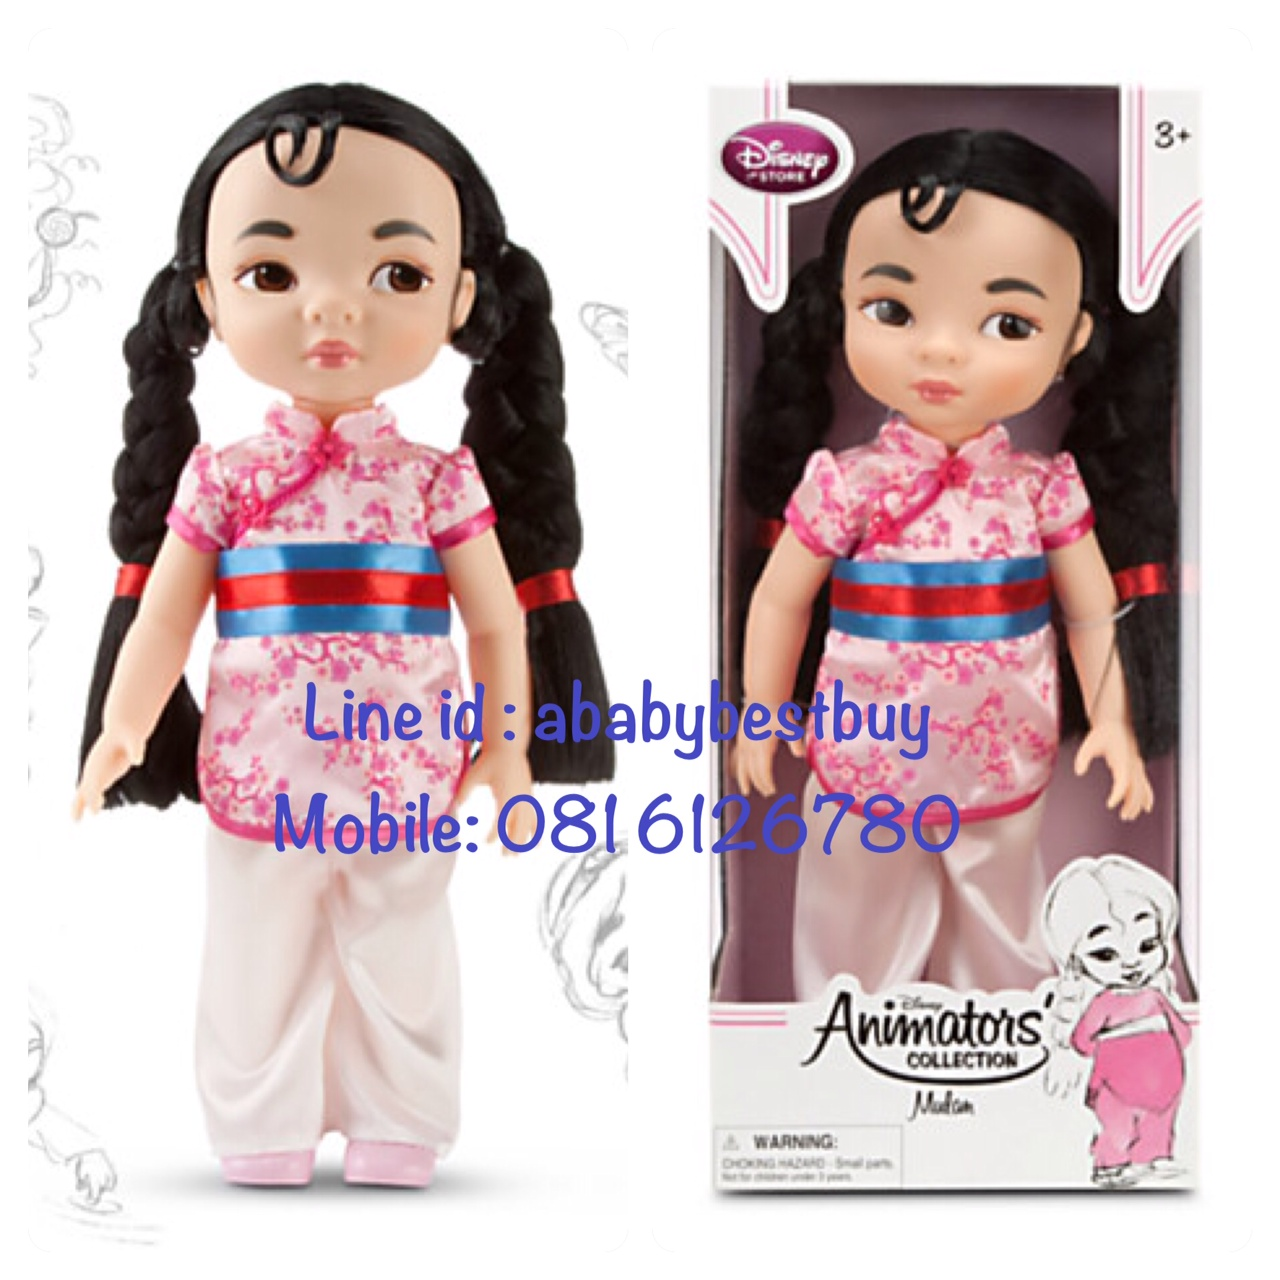 z Disney Animators' Collection Mulan Doll - 16'' รุ่นใหม่ (พร้อมส่ง) ตุ๊กตาดีสนีย์ แอนิเมเตอร์ เจ้าหญิงมู่หลาน รุ่นใหม่ รุ่น2 (รุ่นสอง)